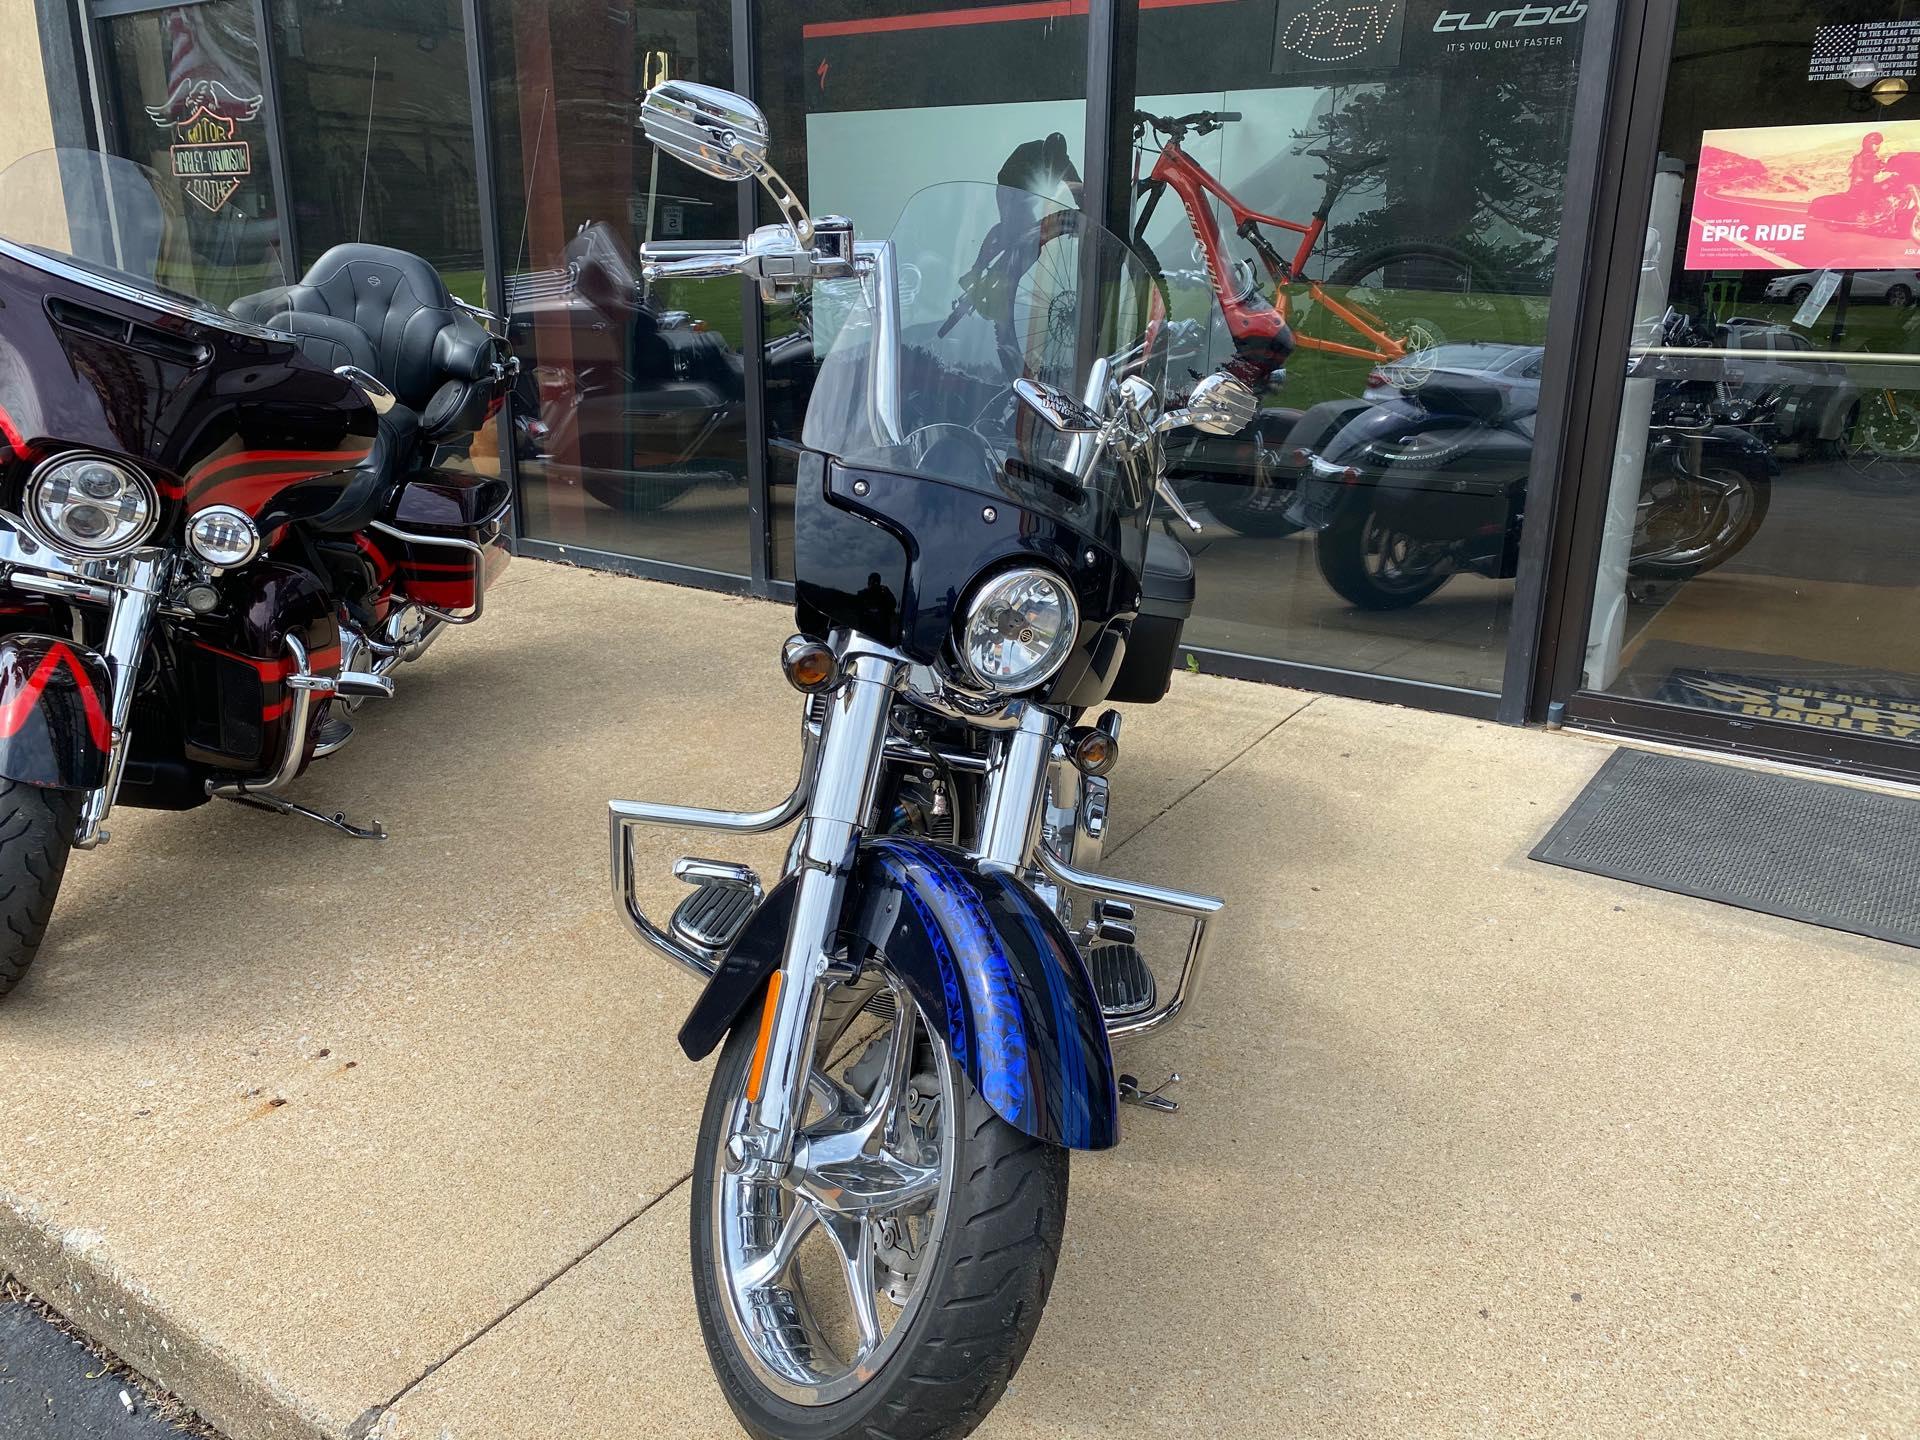 2012 Harley-Davidson Softail CVO Softail Convertible at Gold Star Harley-Davidson